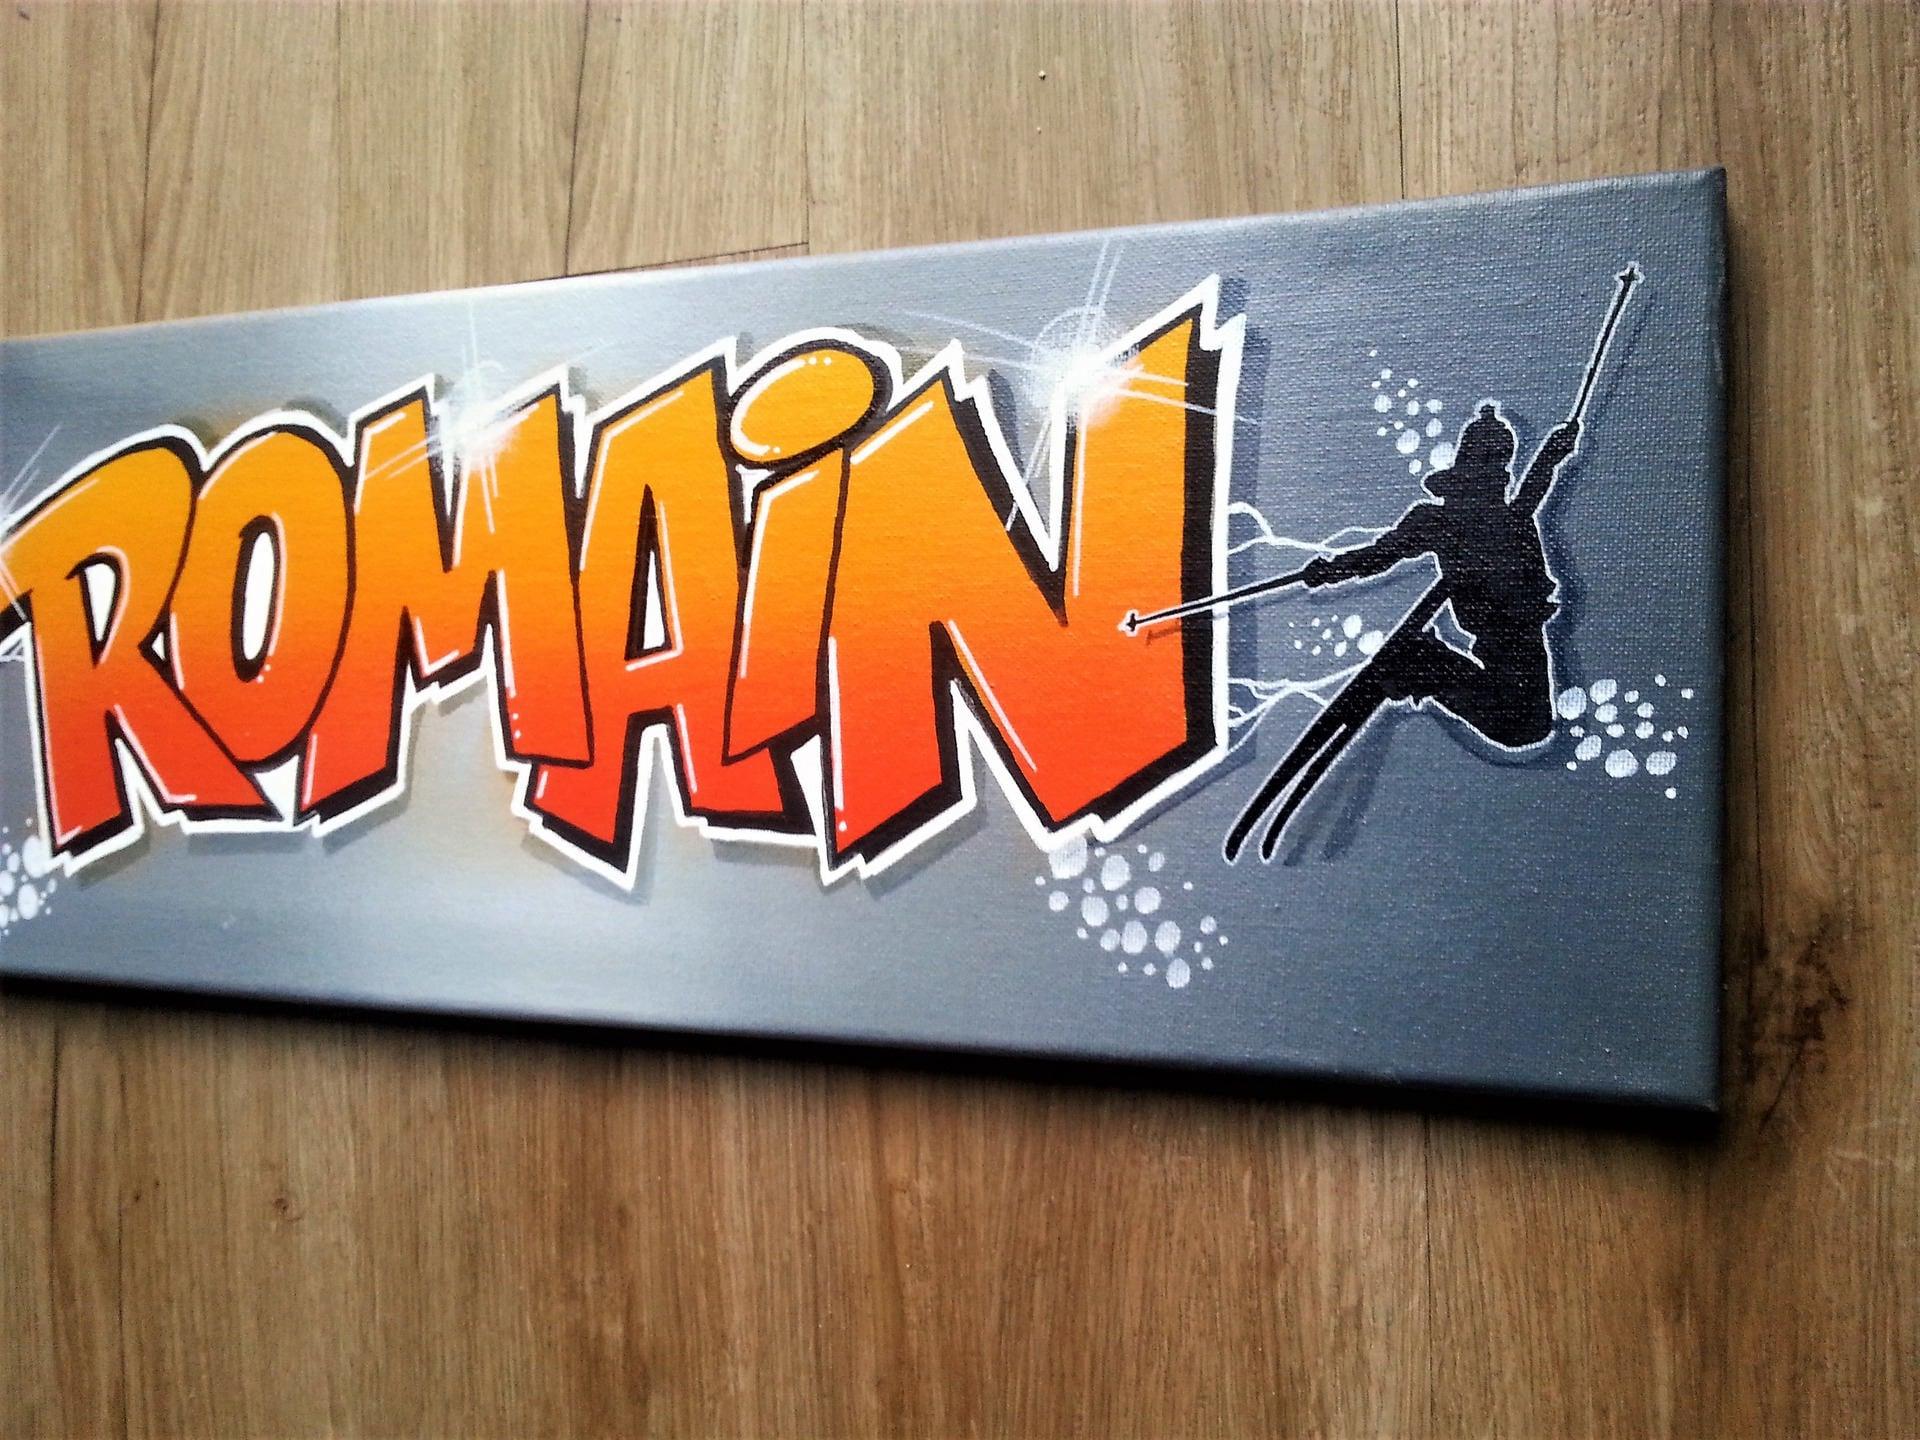 toile graffiti tableau graff prenom romain skate ski free ride. Black Bedroom Furniture Sets. Home Design Ideas